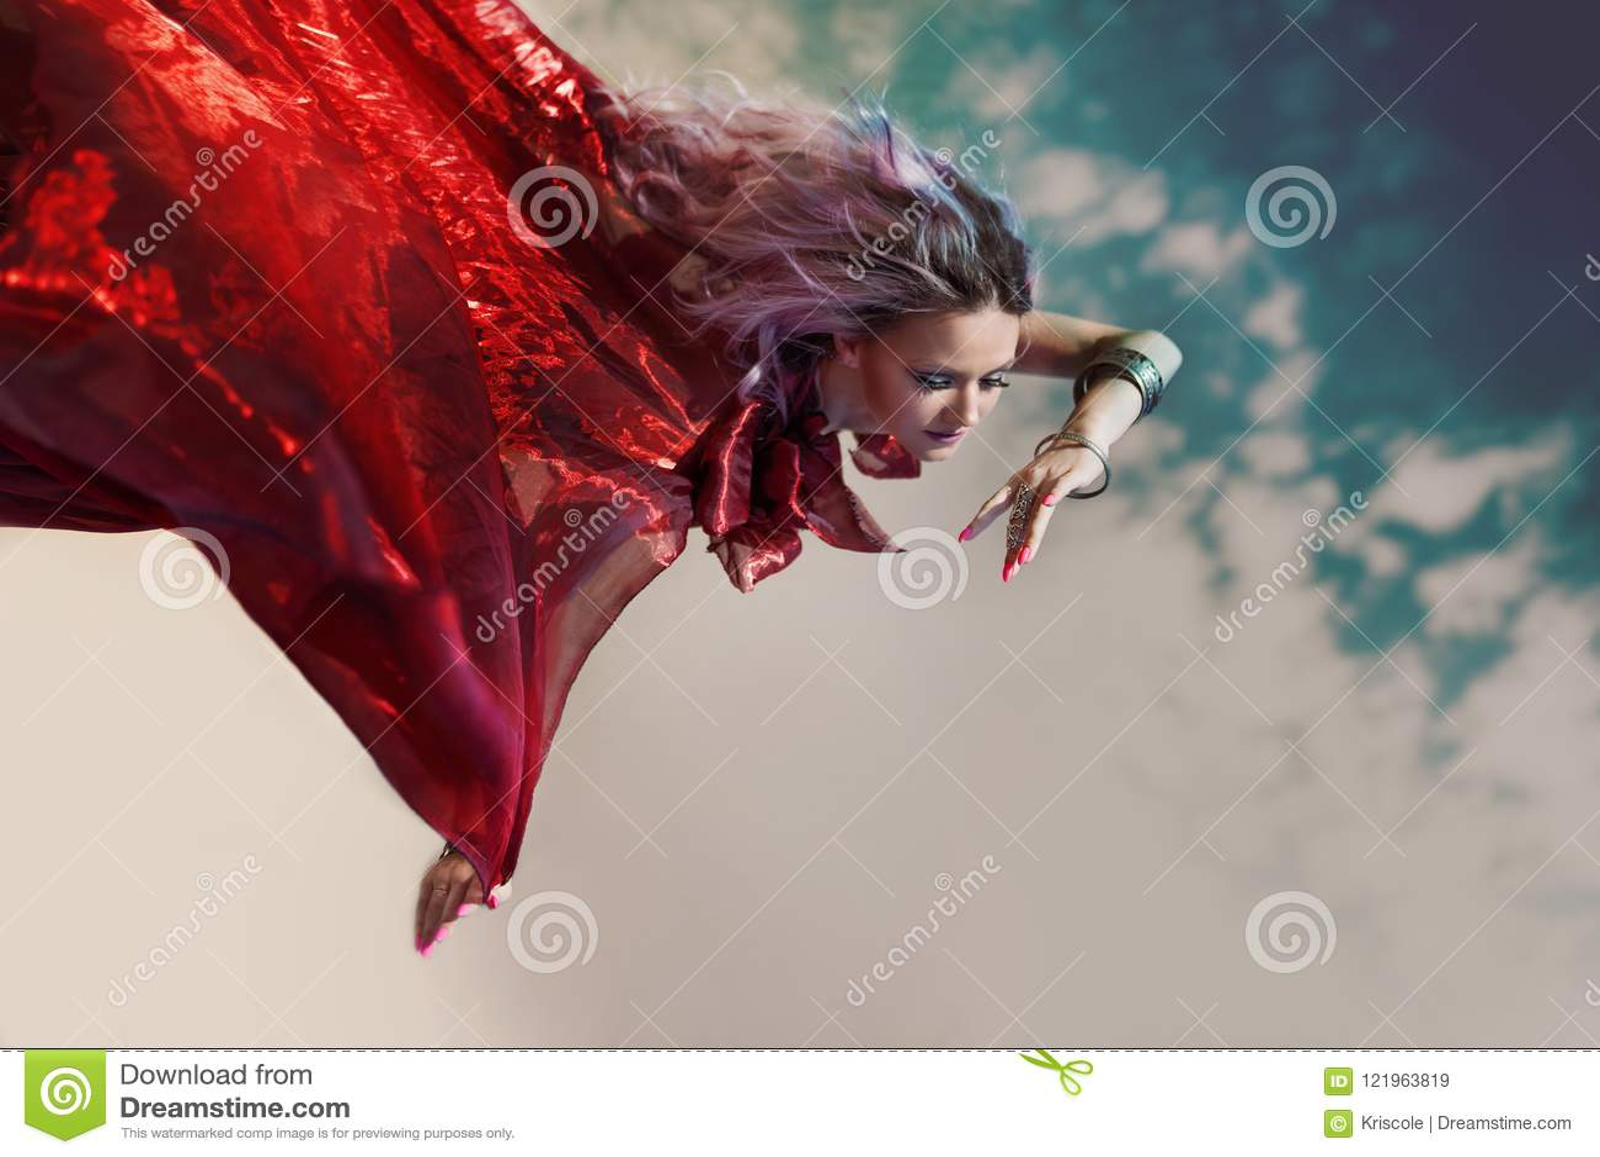 b3b1fcfa17e Fantastic Nymph Flies. Fabulous Portrait Of A Flying Woman In A Red ...